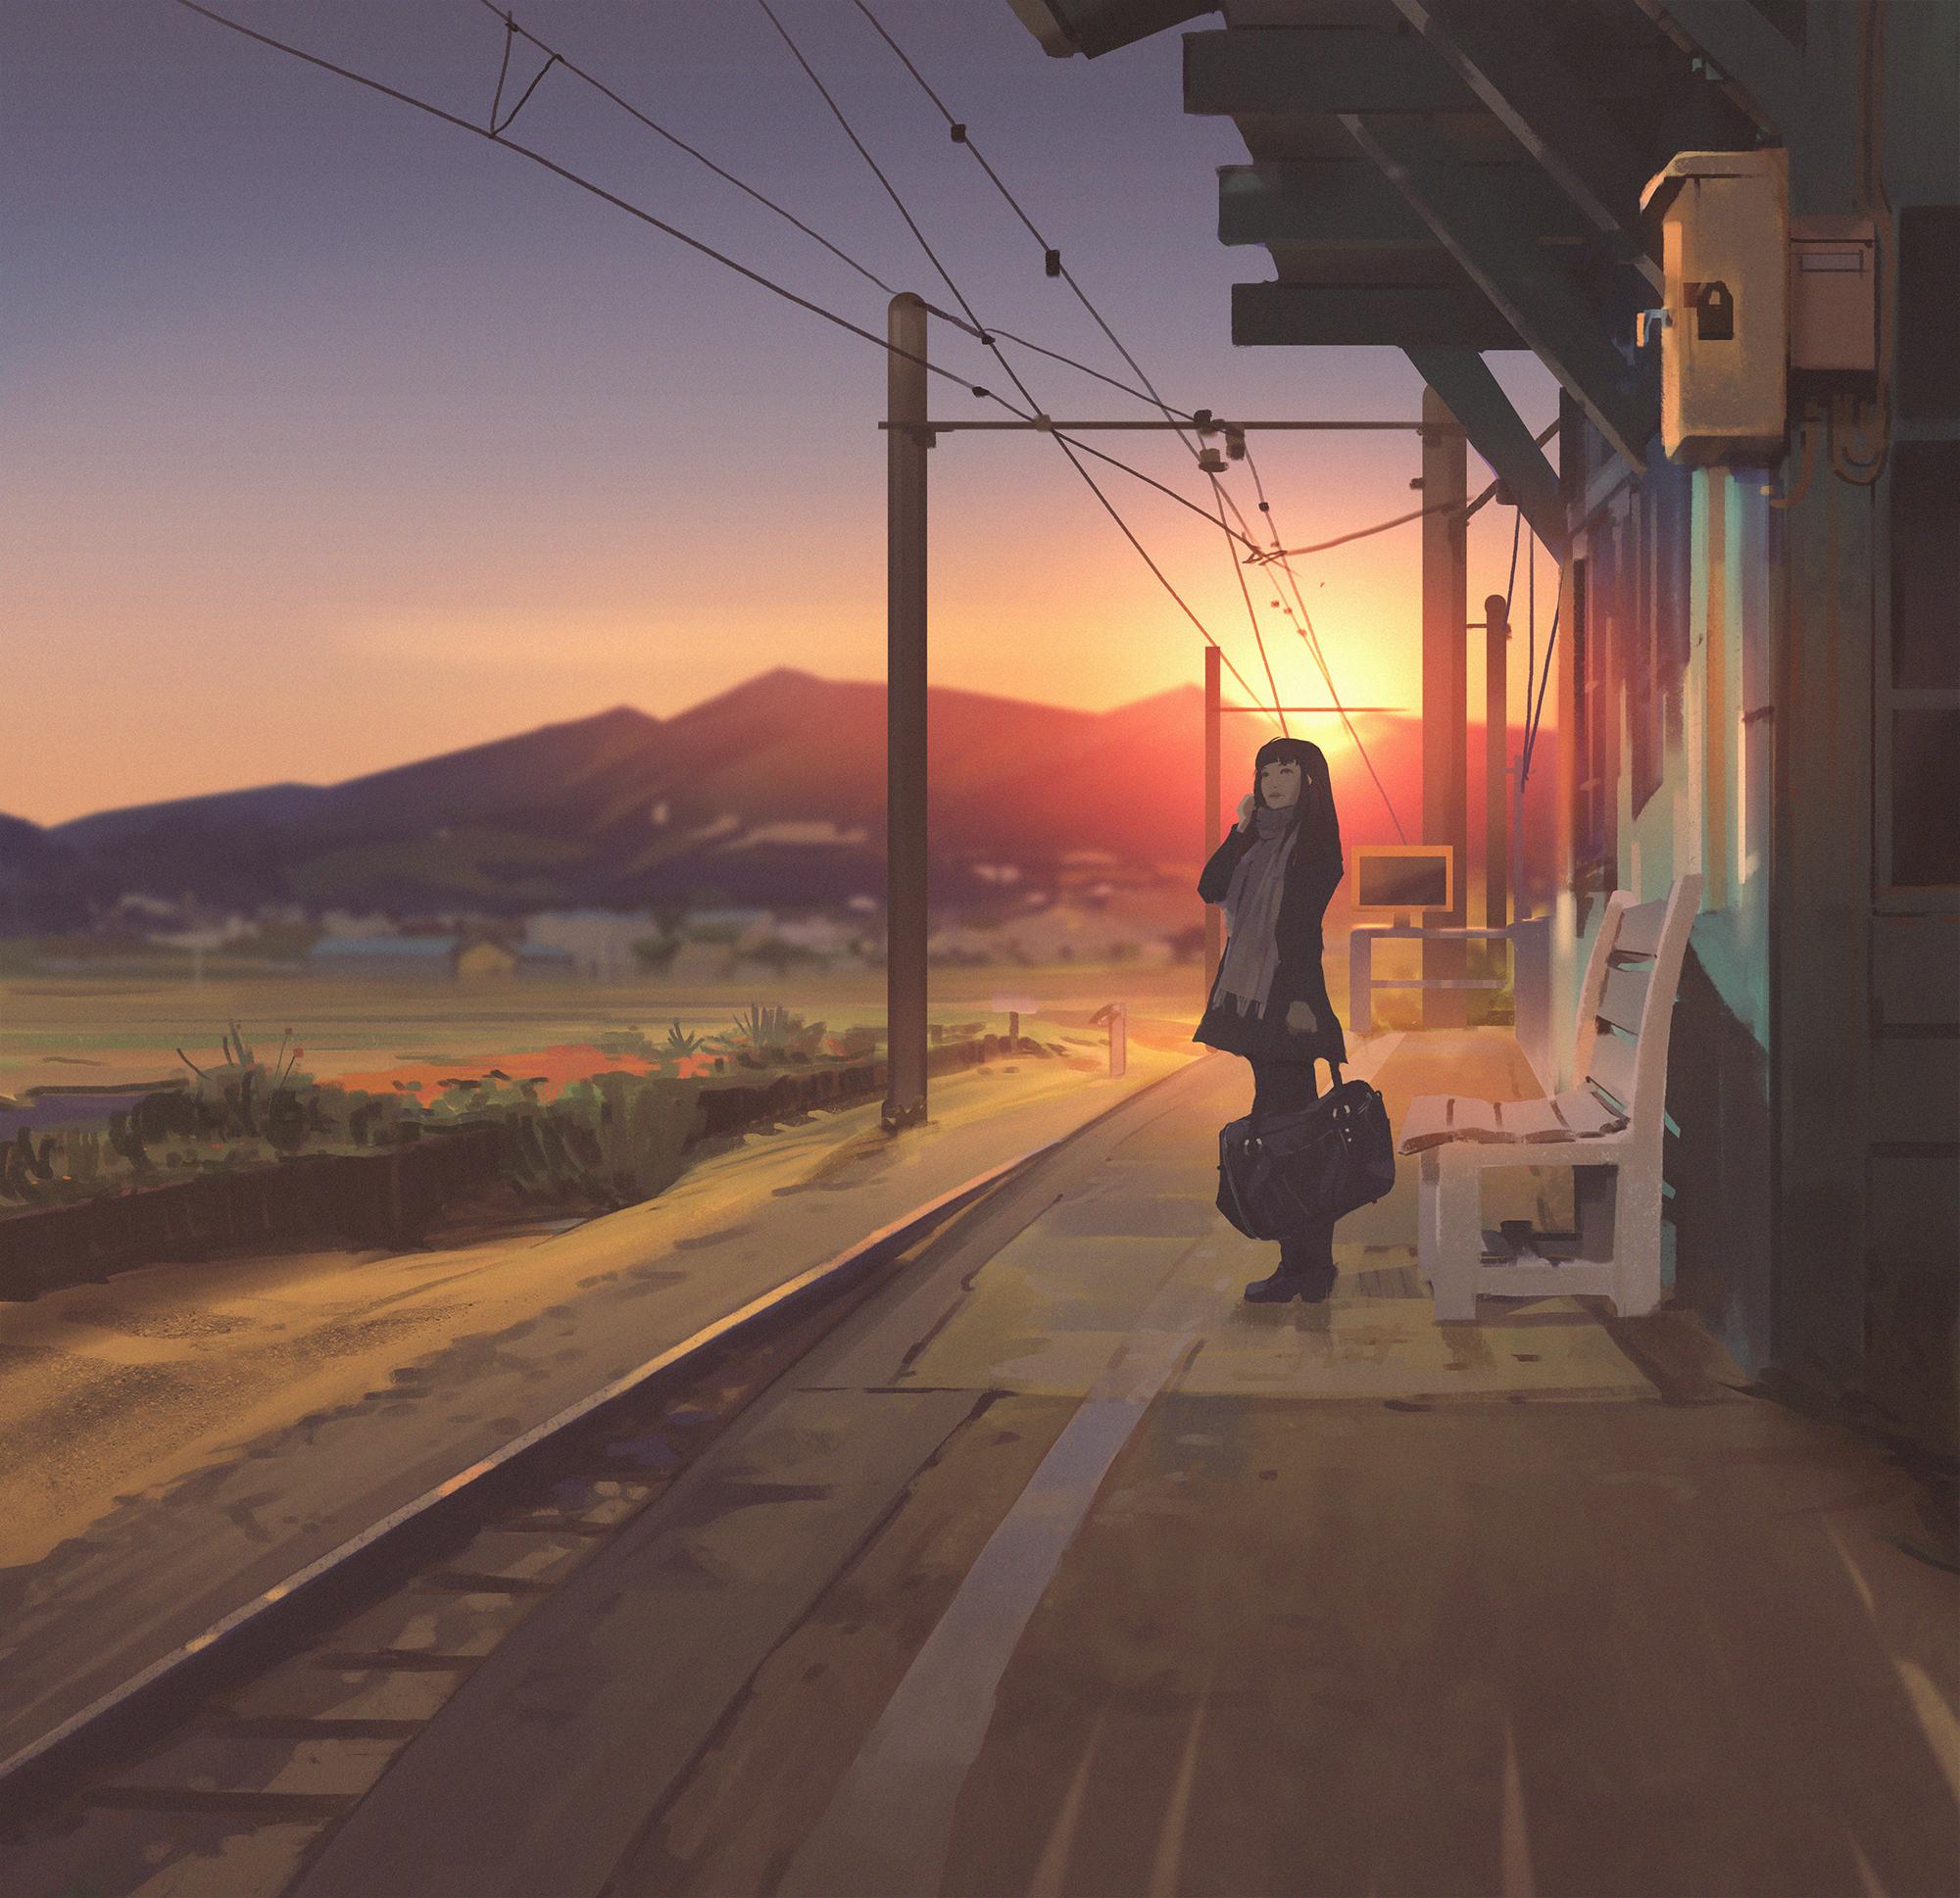 General 2000x1937 women looking away scarf outdoors train station mountains sky sunset depth of field artwork digital art digital painting illustration Atey Ghailan